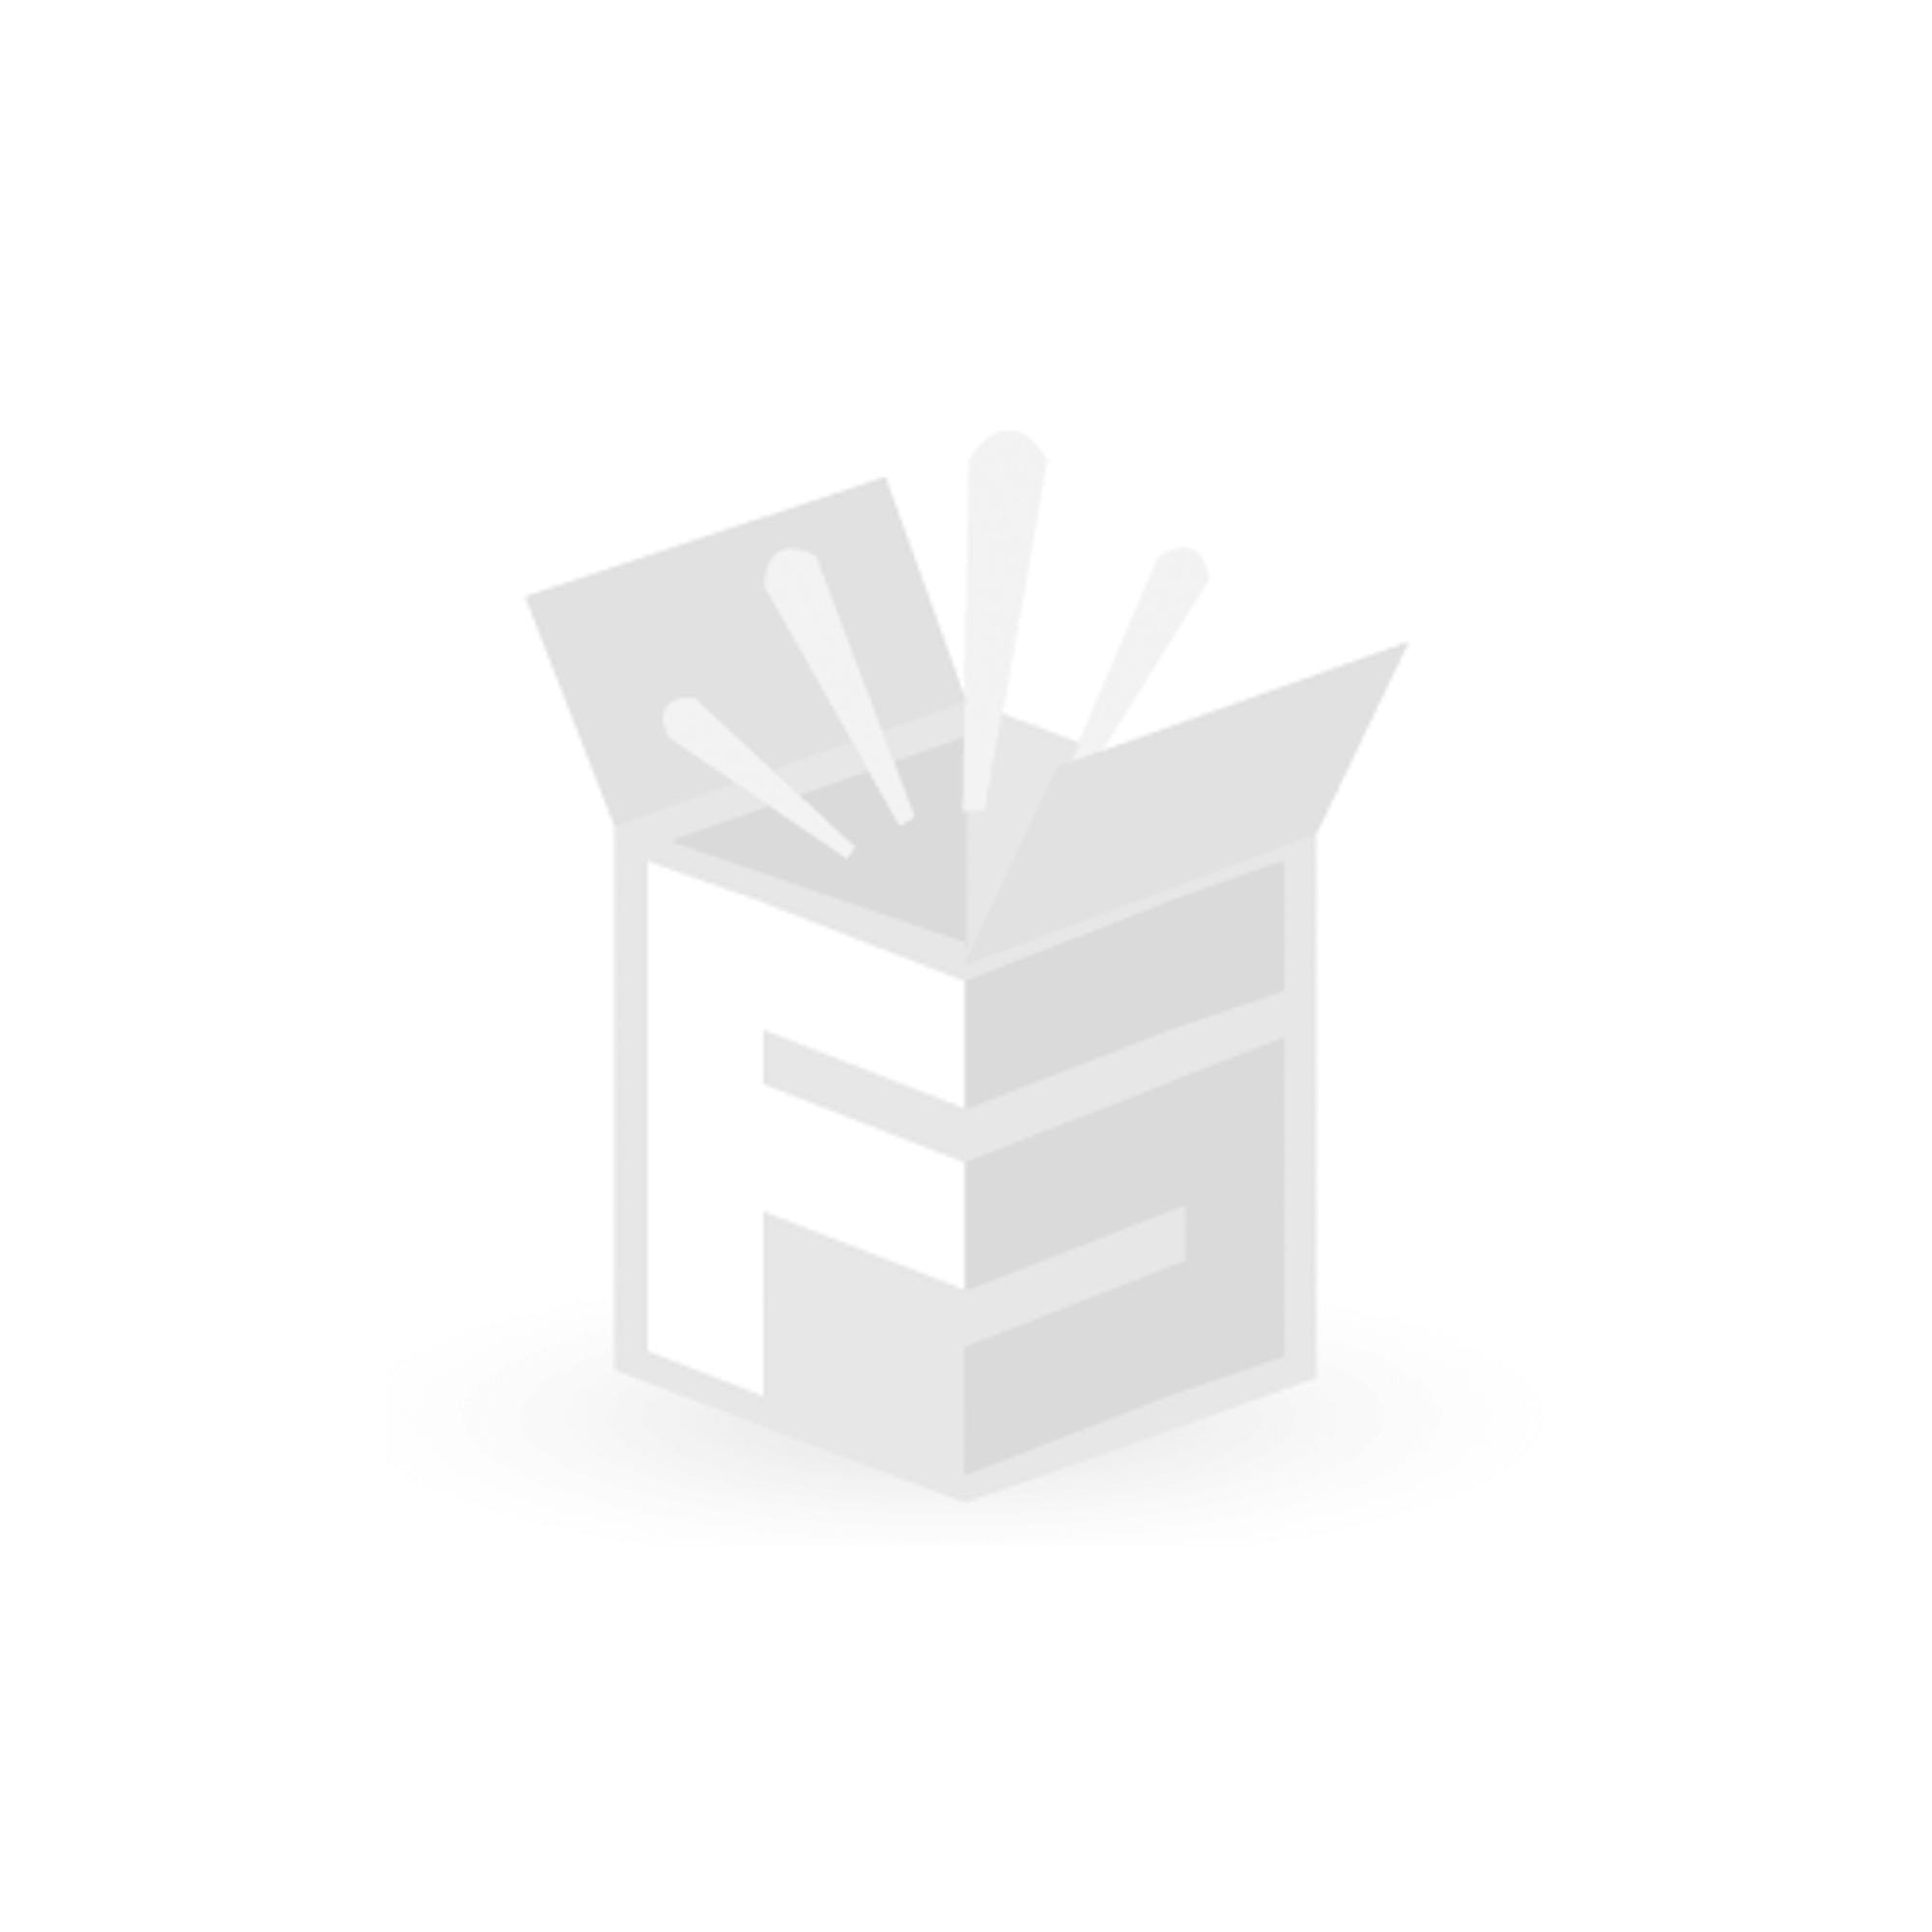 FS-STAR Kisten-Set aus Holz, 3 Stück